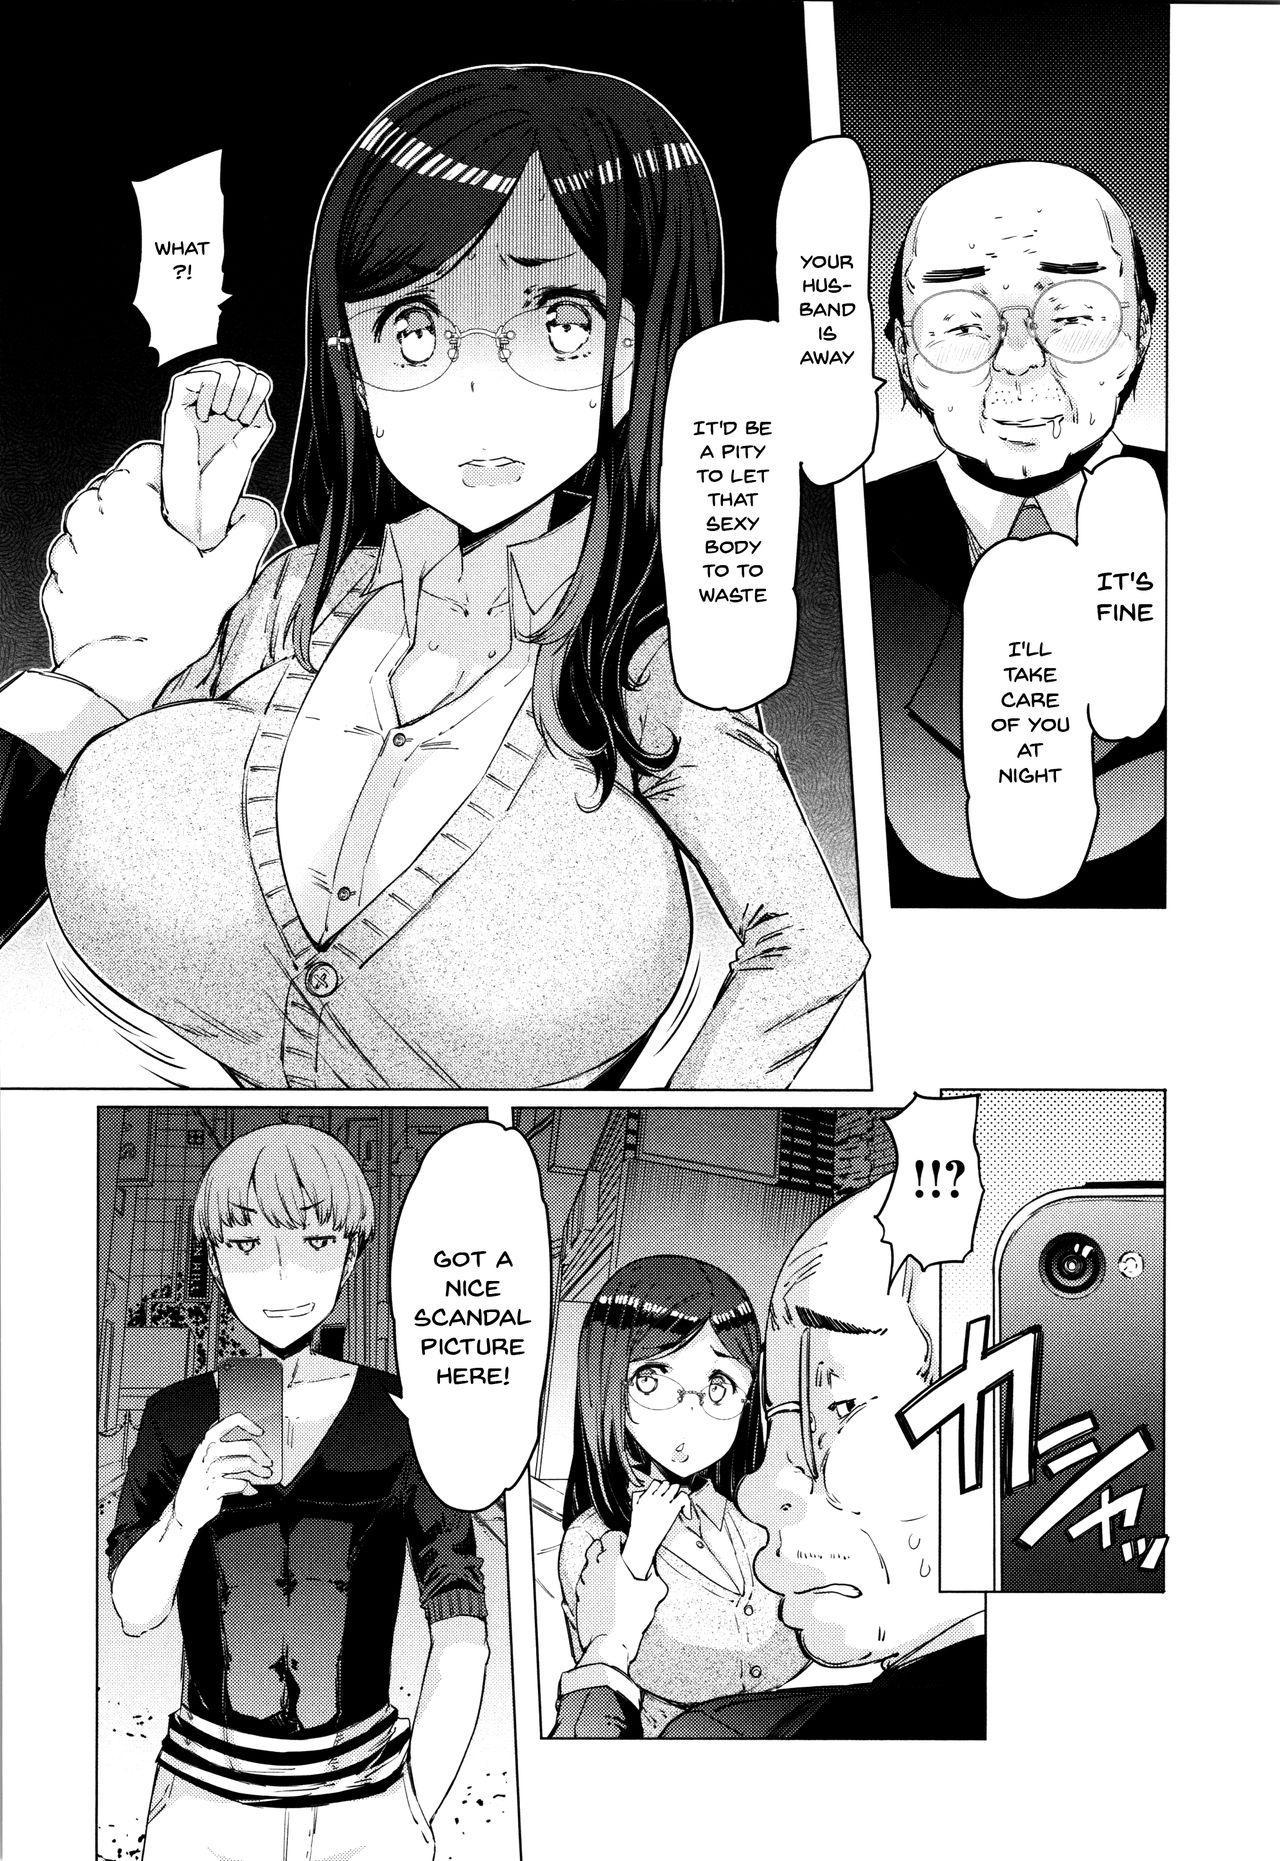 Hitozuma ga Ero Sugite Shigoto ni Naranai! | These Housewives Are Too Lewd I Can't Help It! Ch.1-3 45